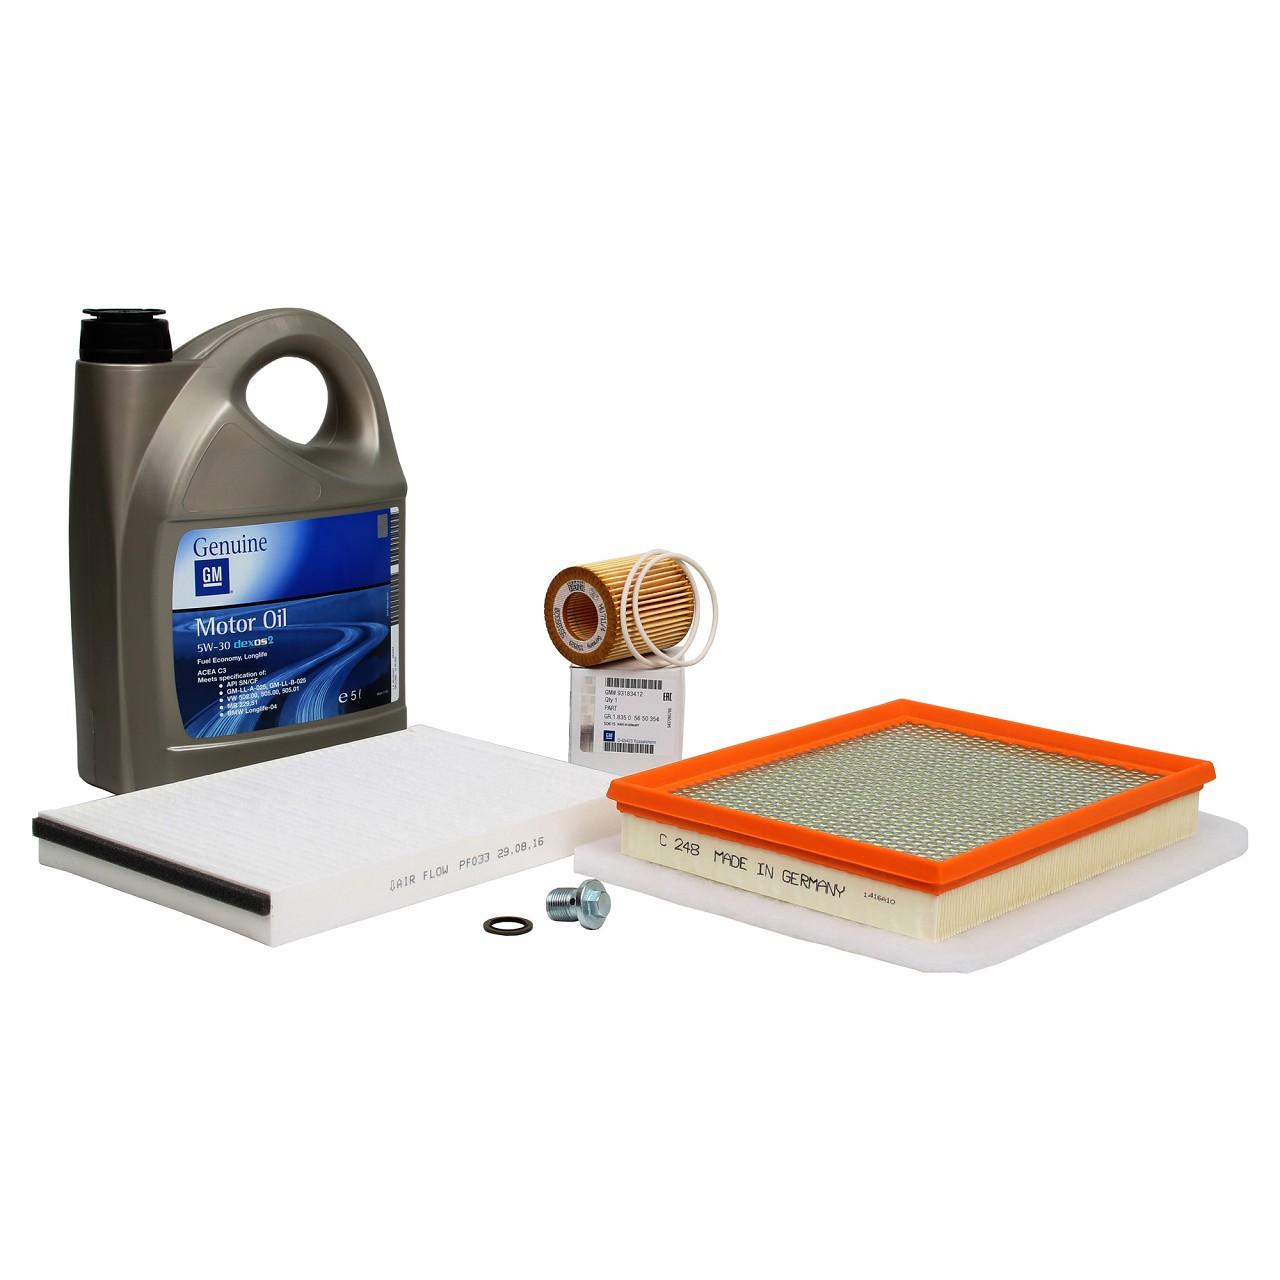 OPEL Inspektionskit Ölwechsel 5W-30 dexos2 Filterset Astra H 1.9 CDTI 100-150 PS